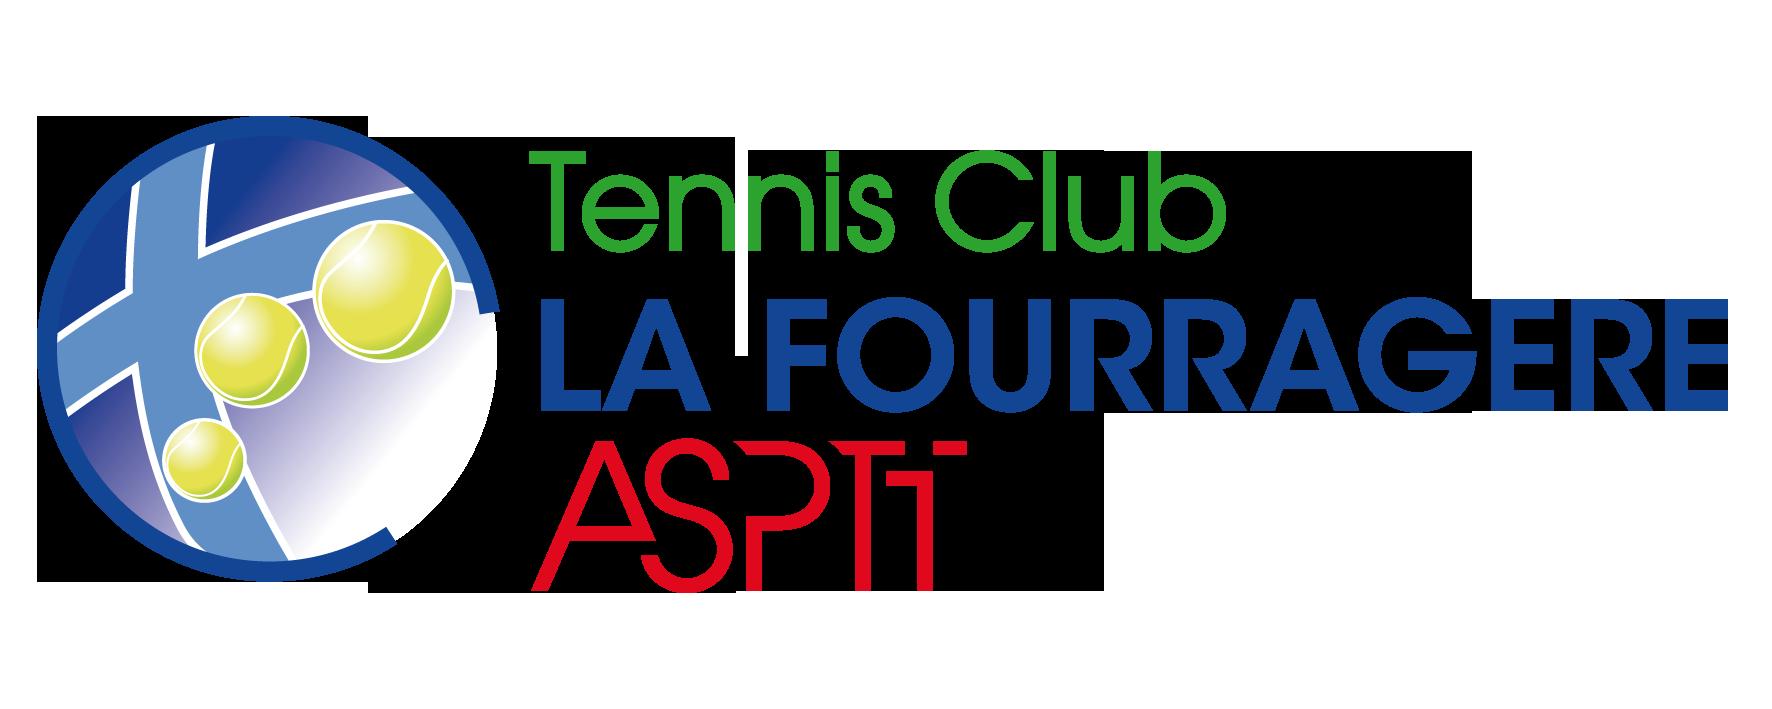 Tennis Club La Fourragère ASPTT